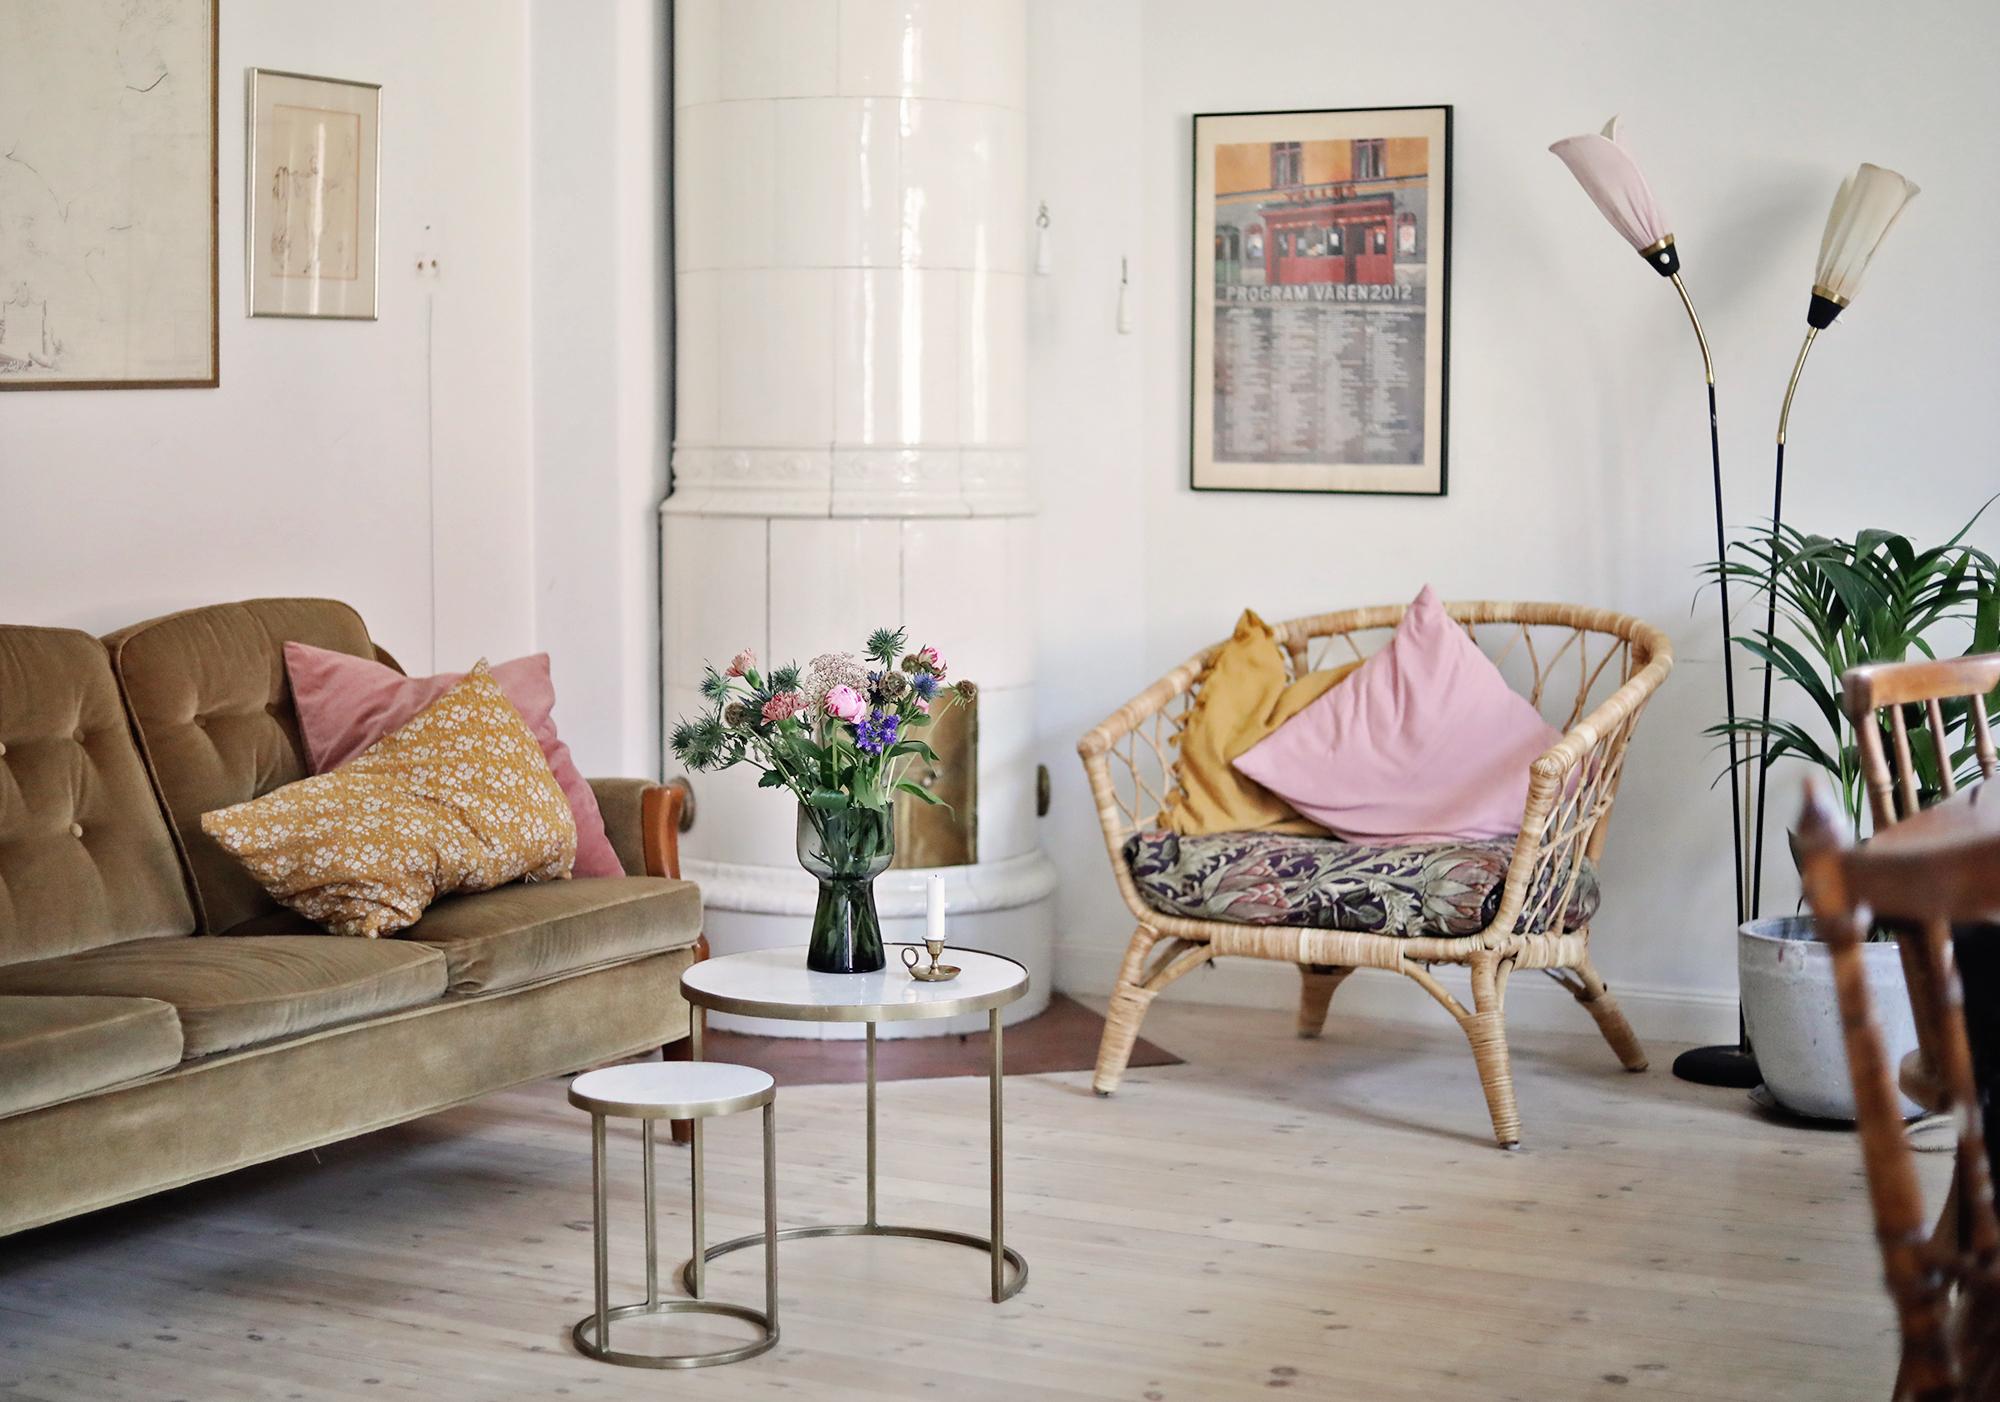 vardagsrum soffa kakelugn fåtölj retro tellus bio midsommarkransen